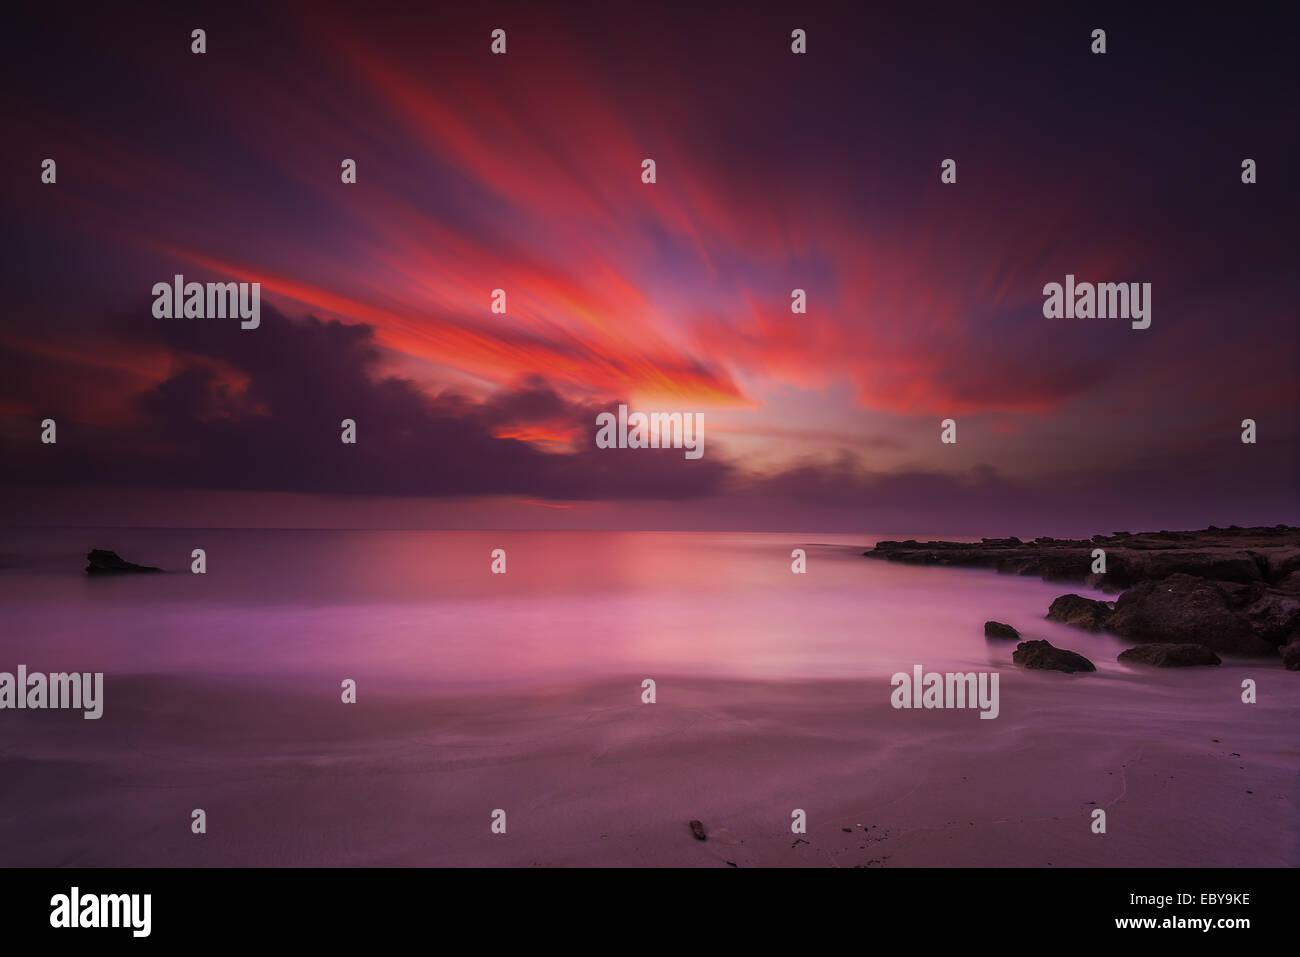 Sunset moment in Agios Theologos beach in Kos island Greece - Stock Image